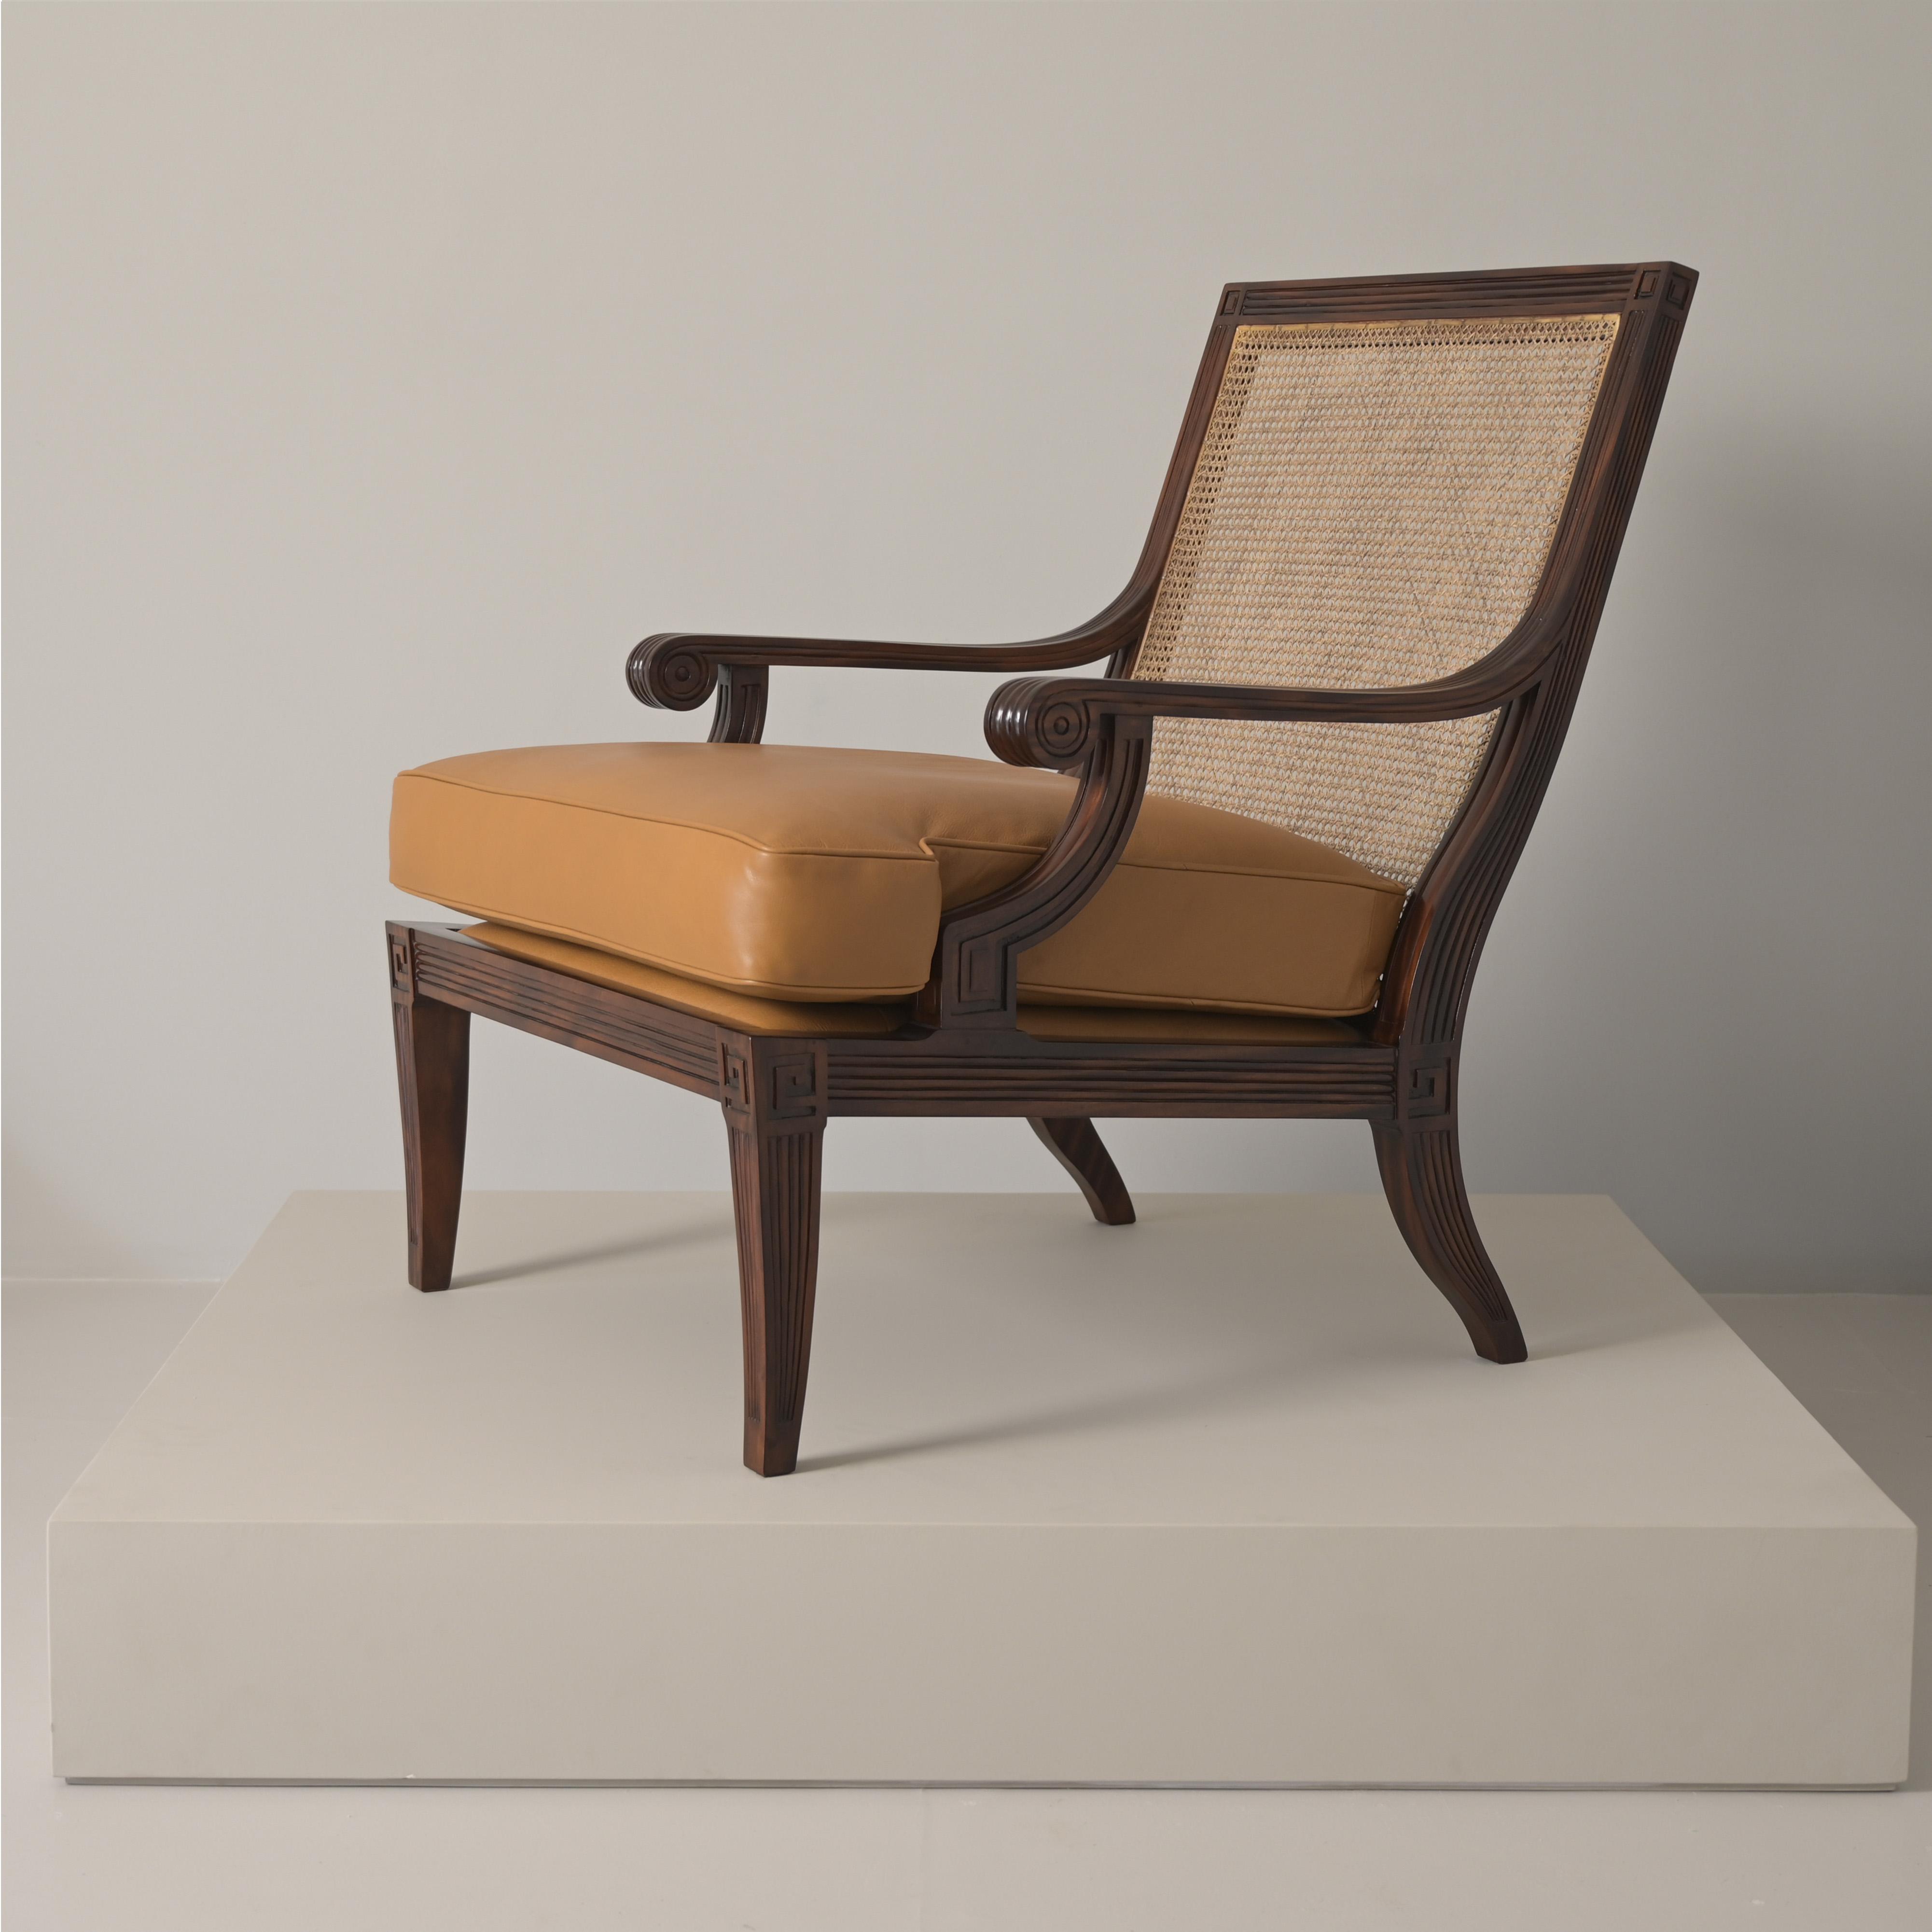 Meander armchair